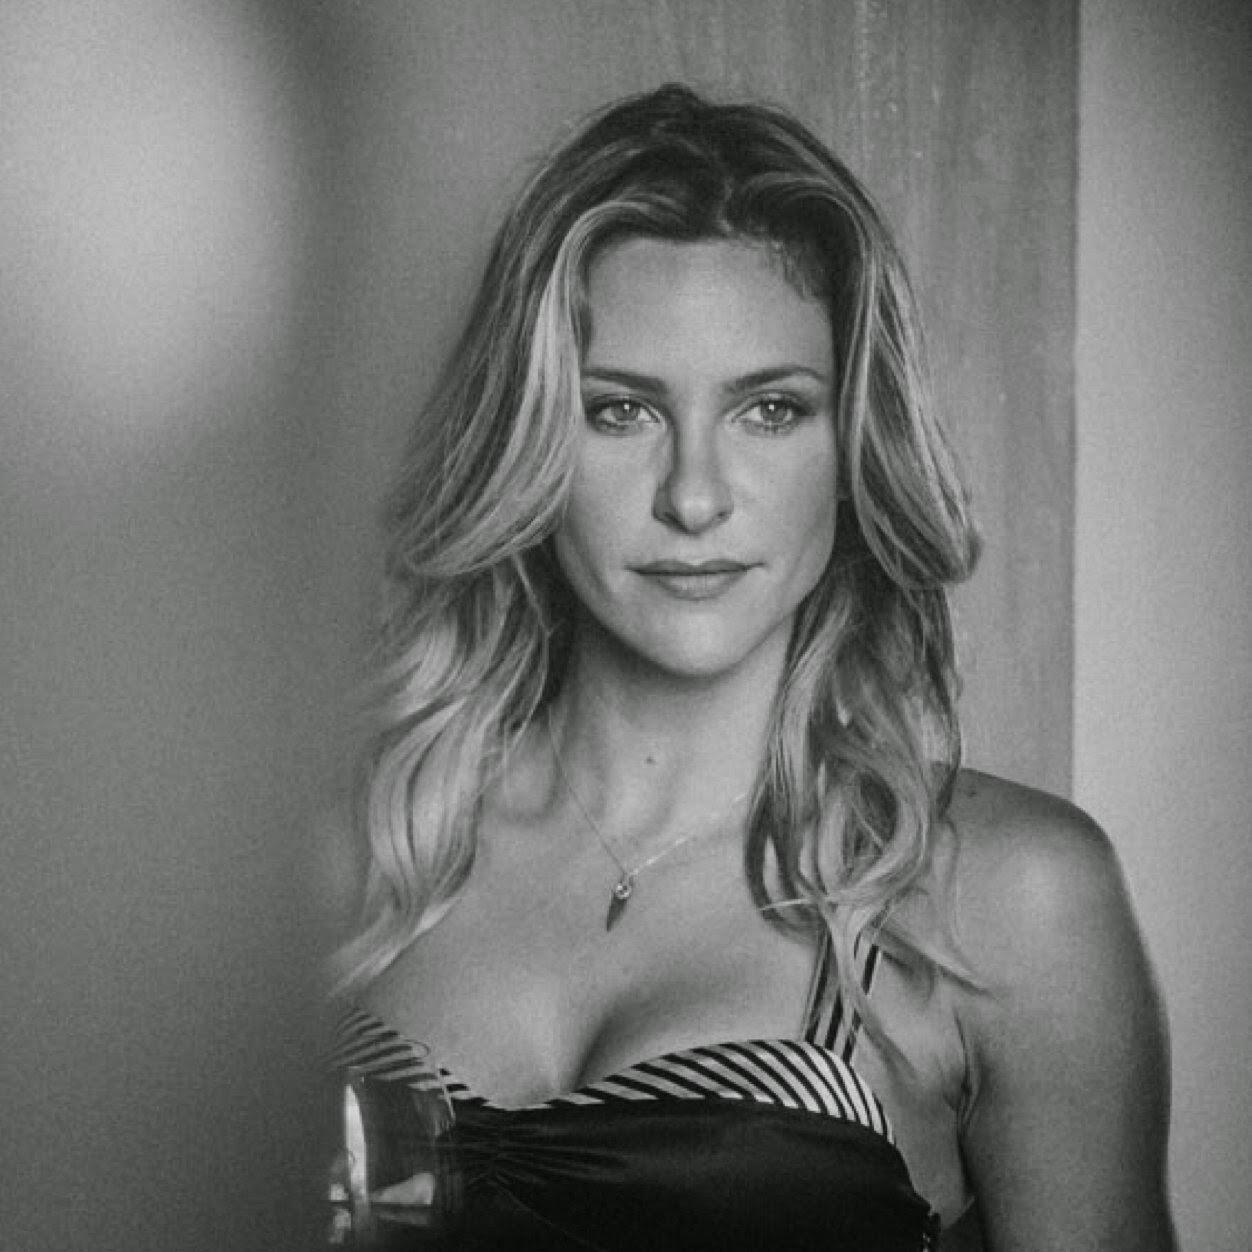 Kristin Dattilo,Kathryn Ish Porno image Ali Bastian (born 1982),Ann Jillian